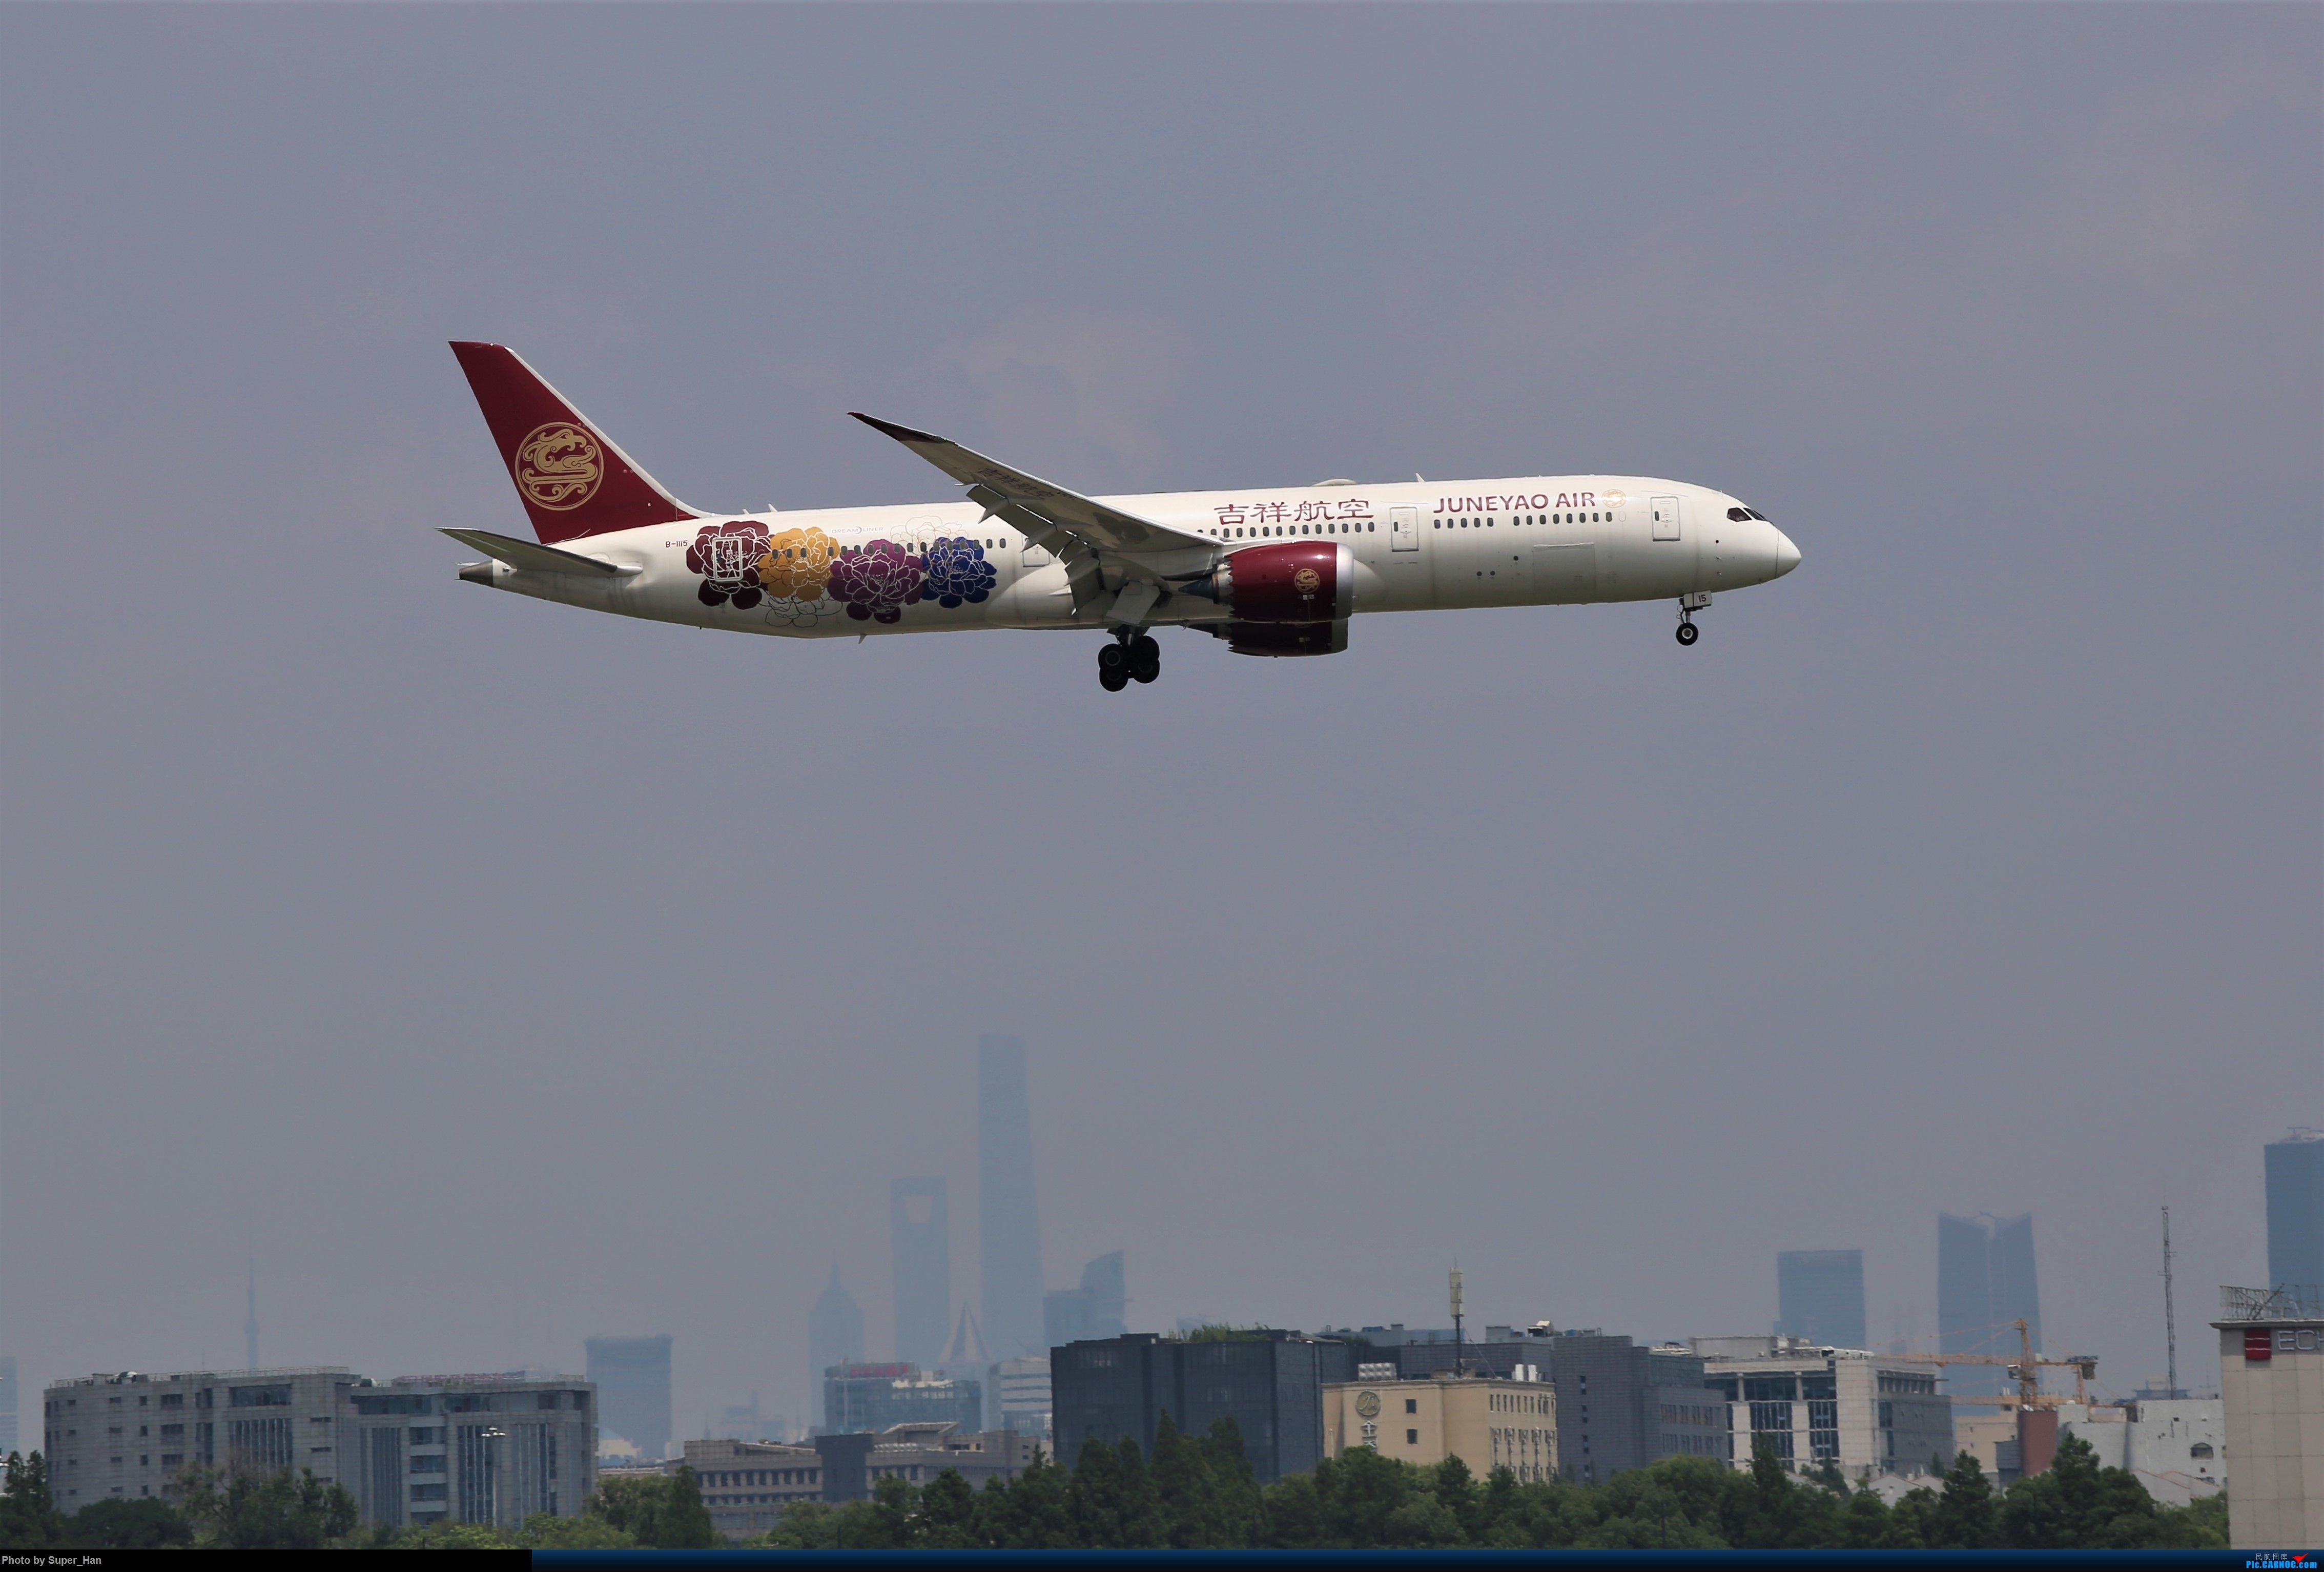 Re:[原创]【杭州飞友会】浦东之上 BOEING 787-9 B-1115 中国上海虹桥国际机场